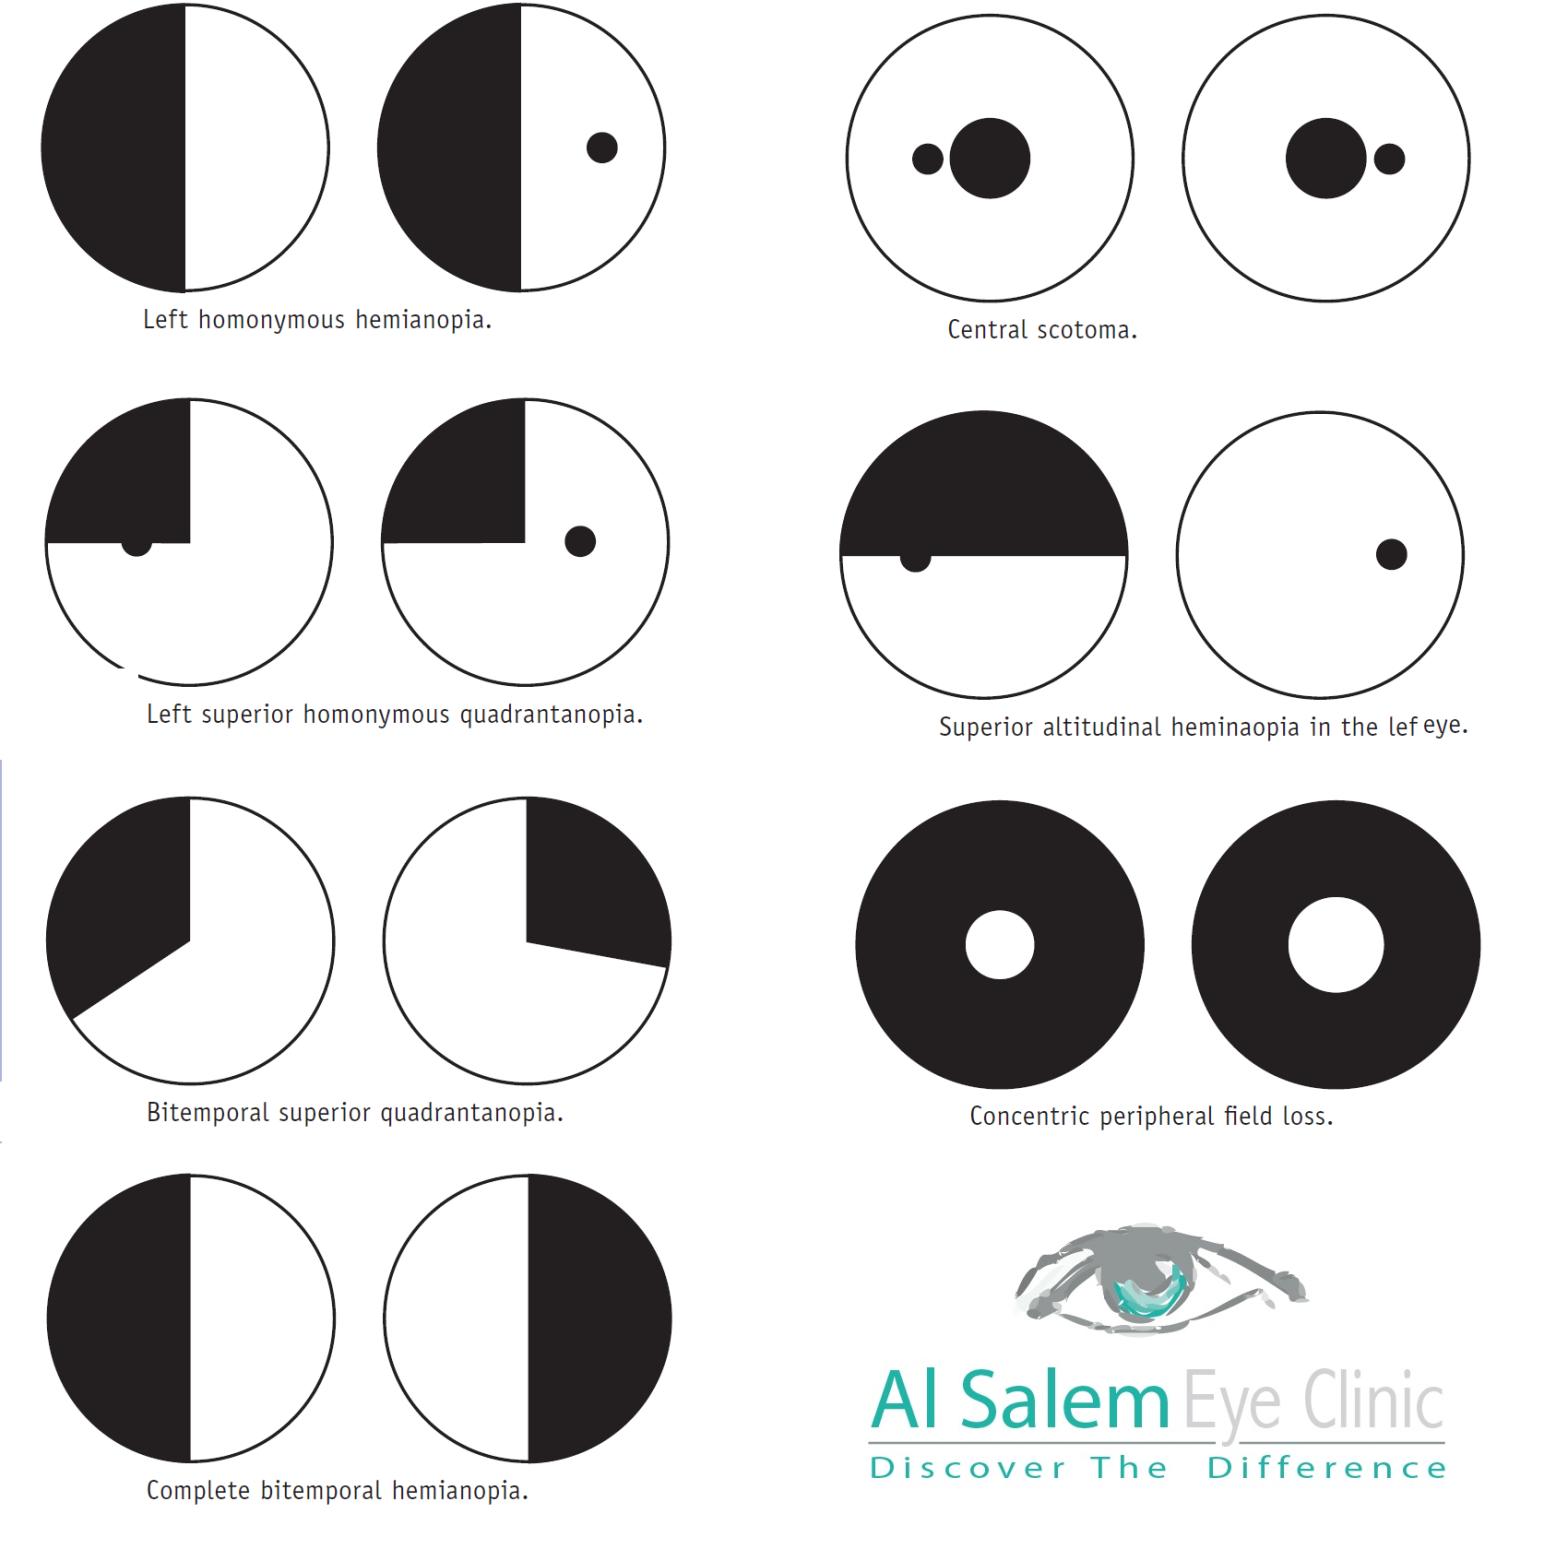 AL-Salem Eye Clinic